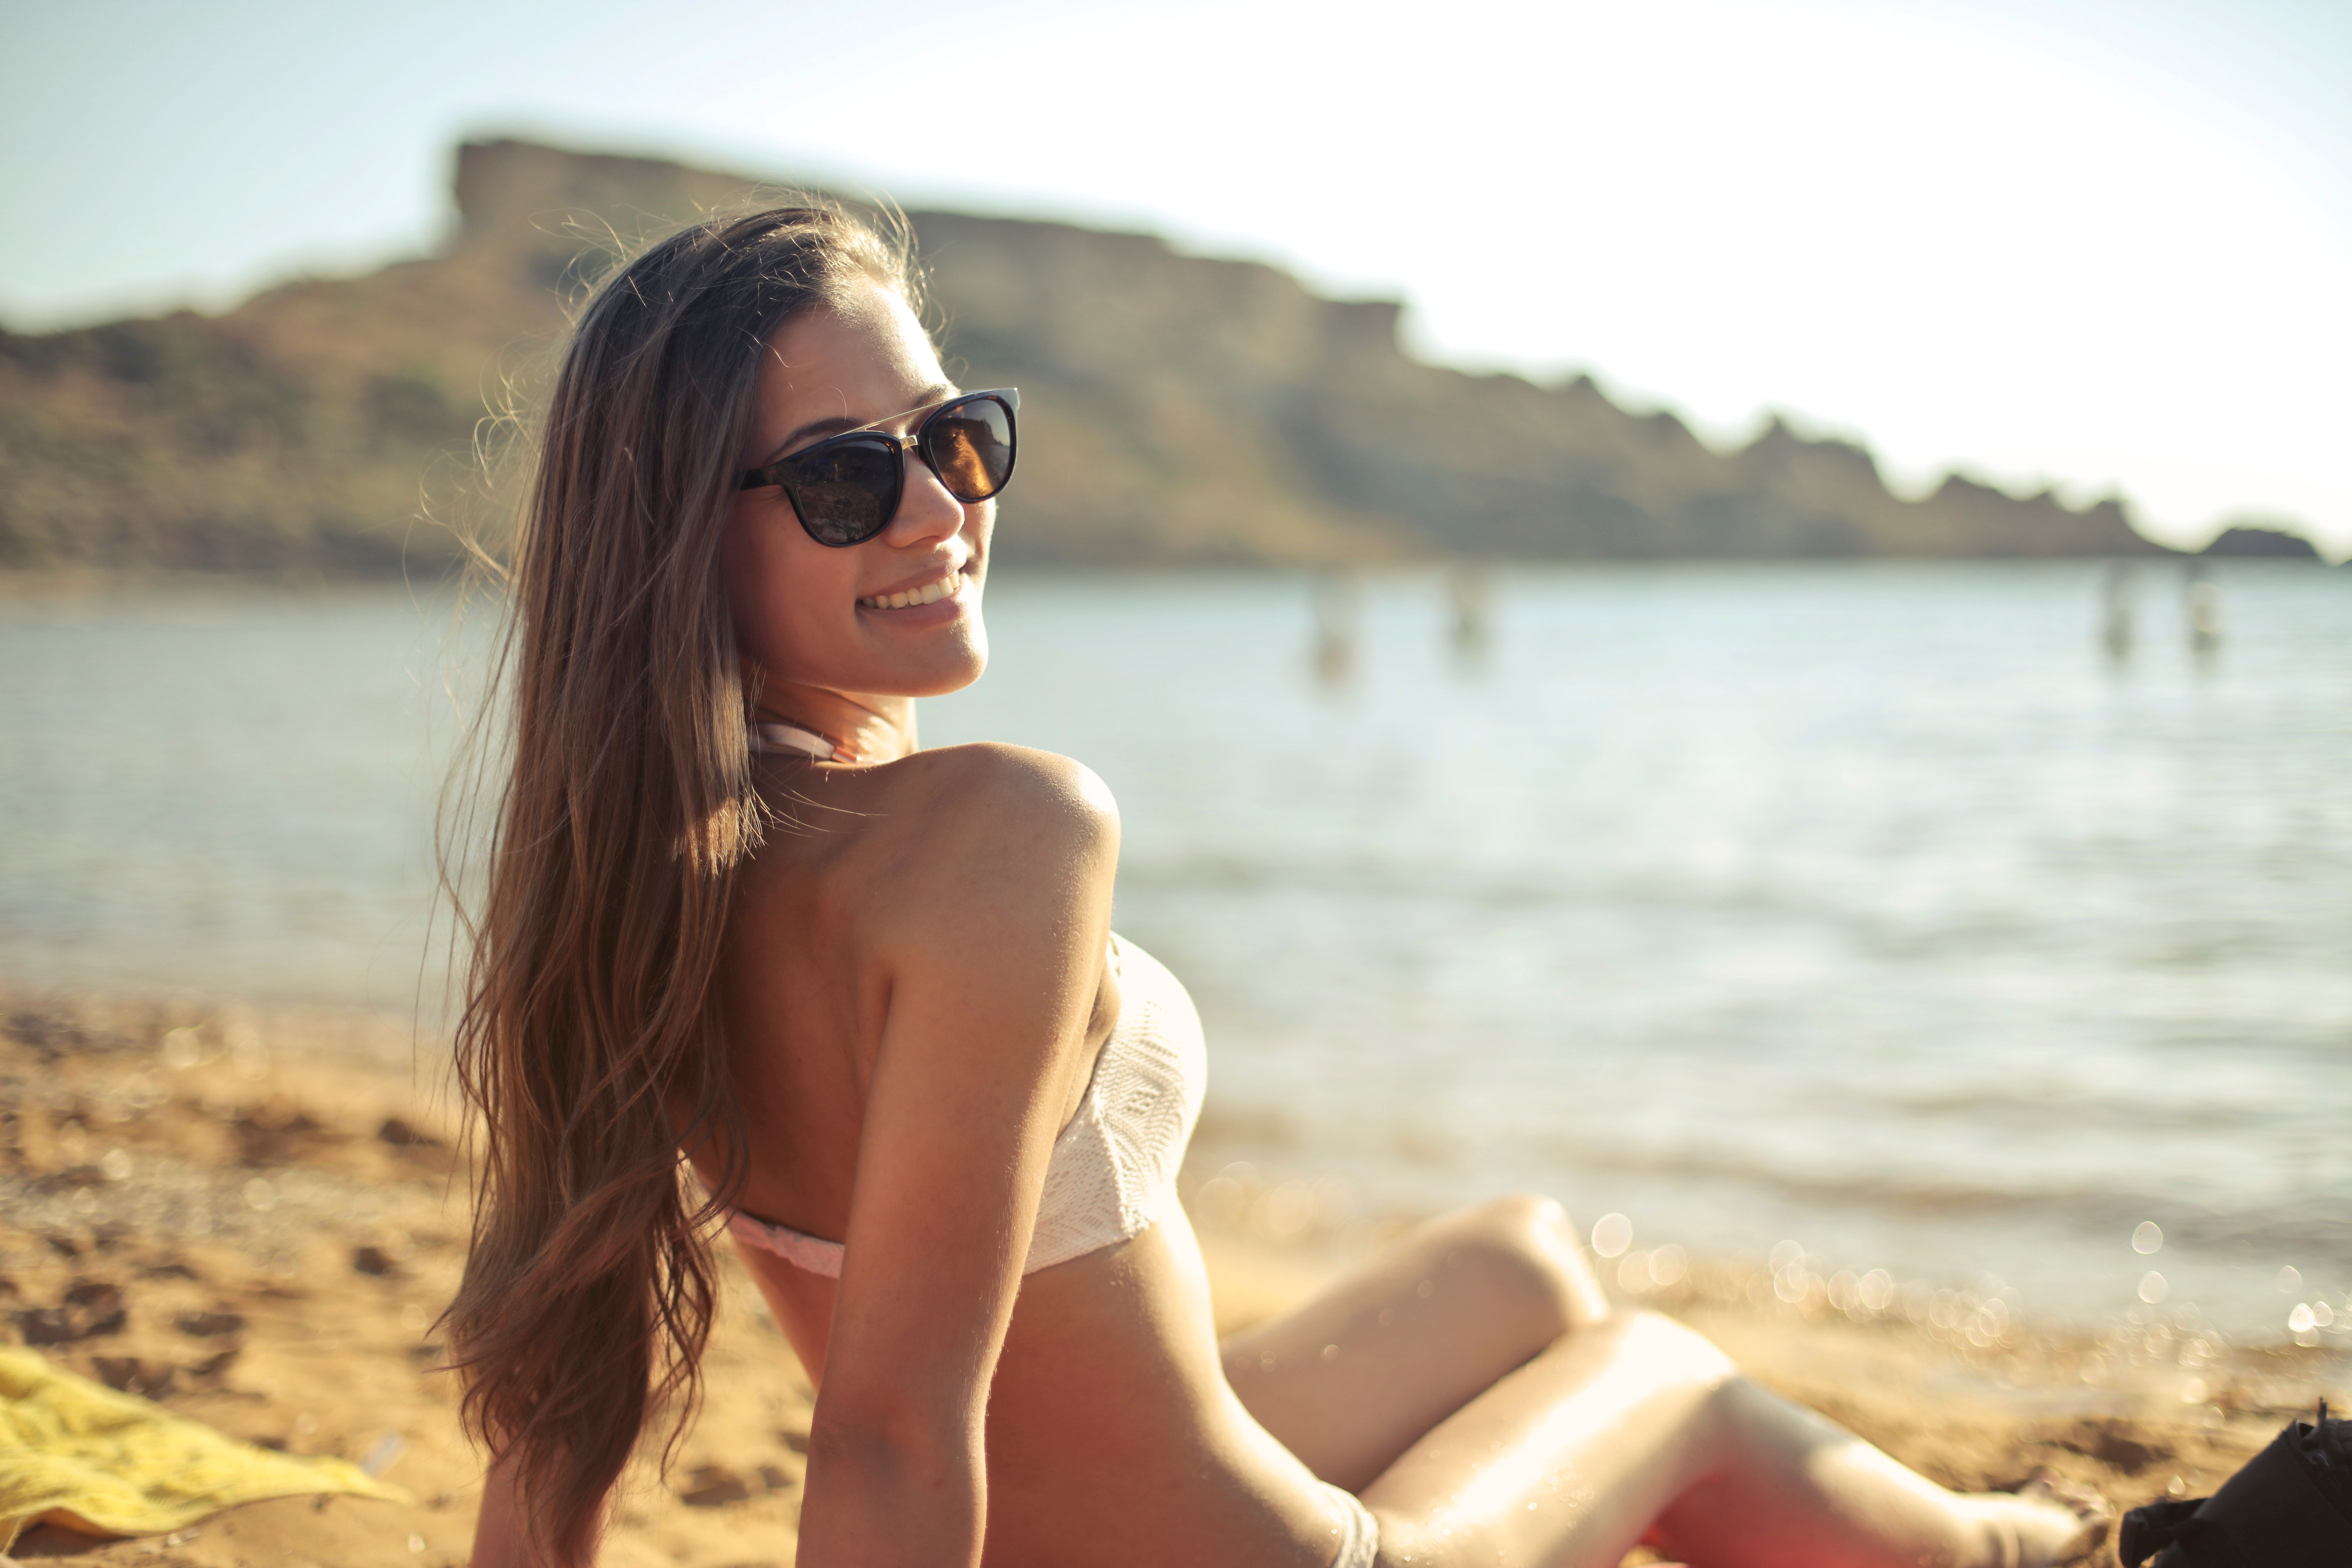 Woman in White Bikini Set Sitting Near Seashore, Sun, Sea, Seascape, Seashore, HQ Photo